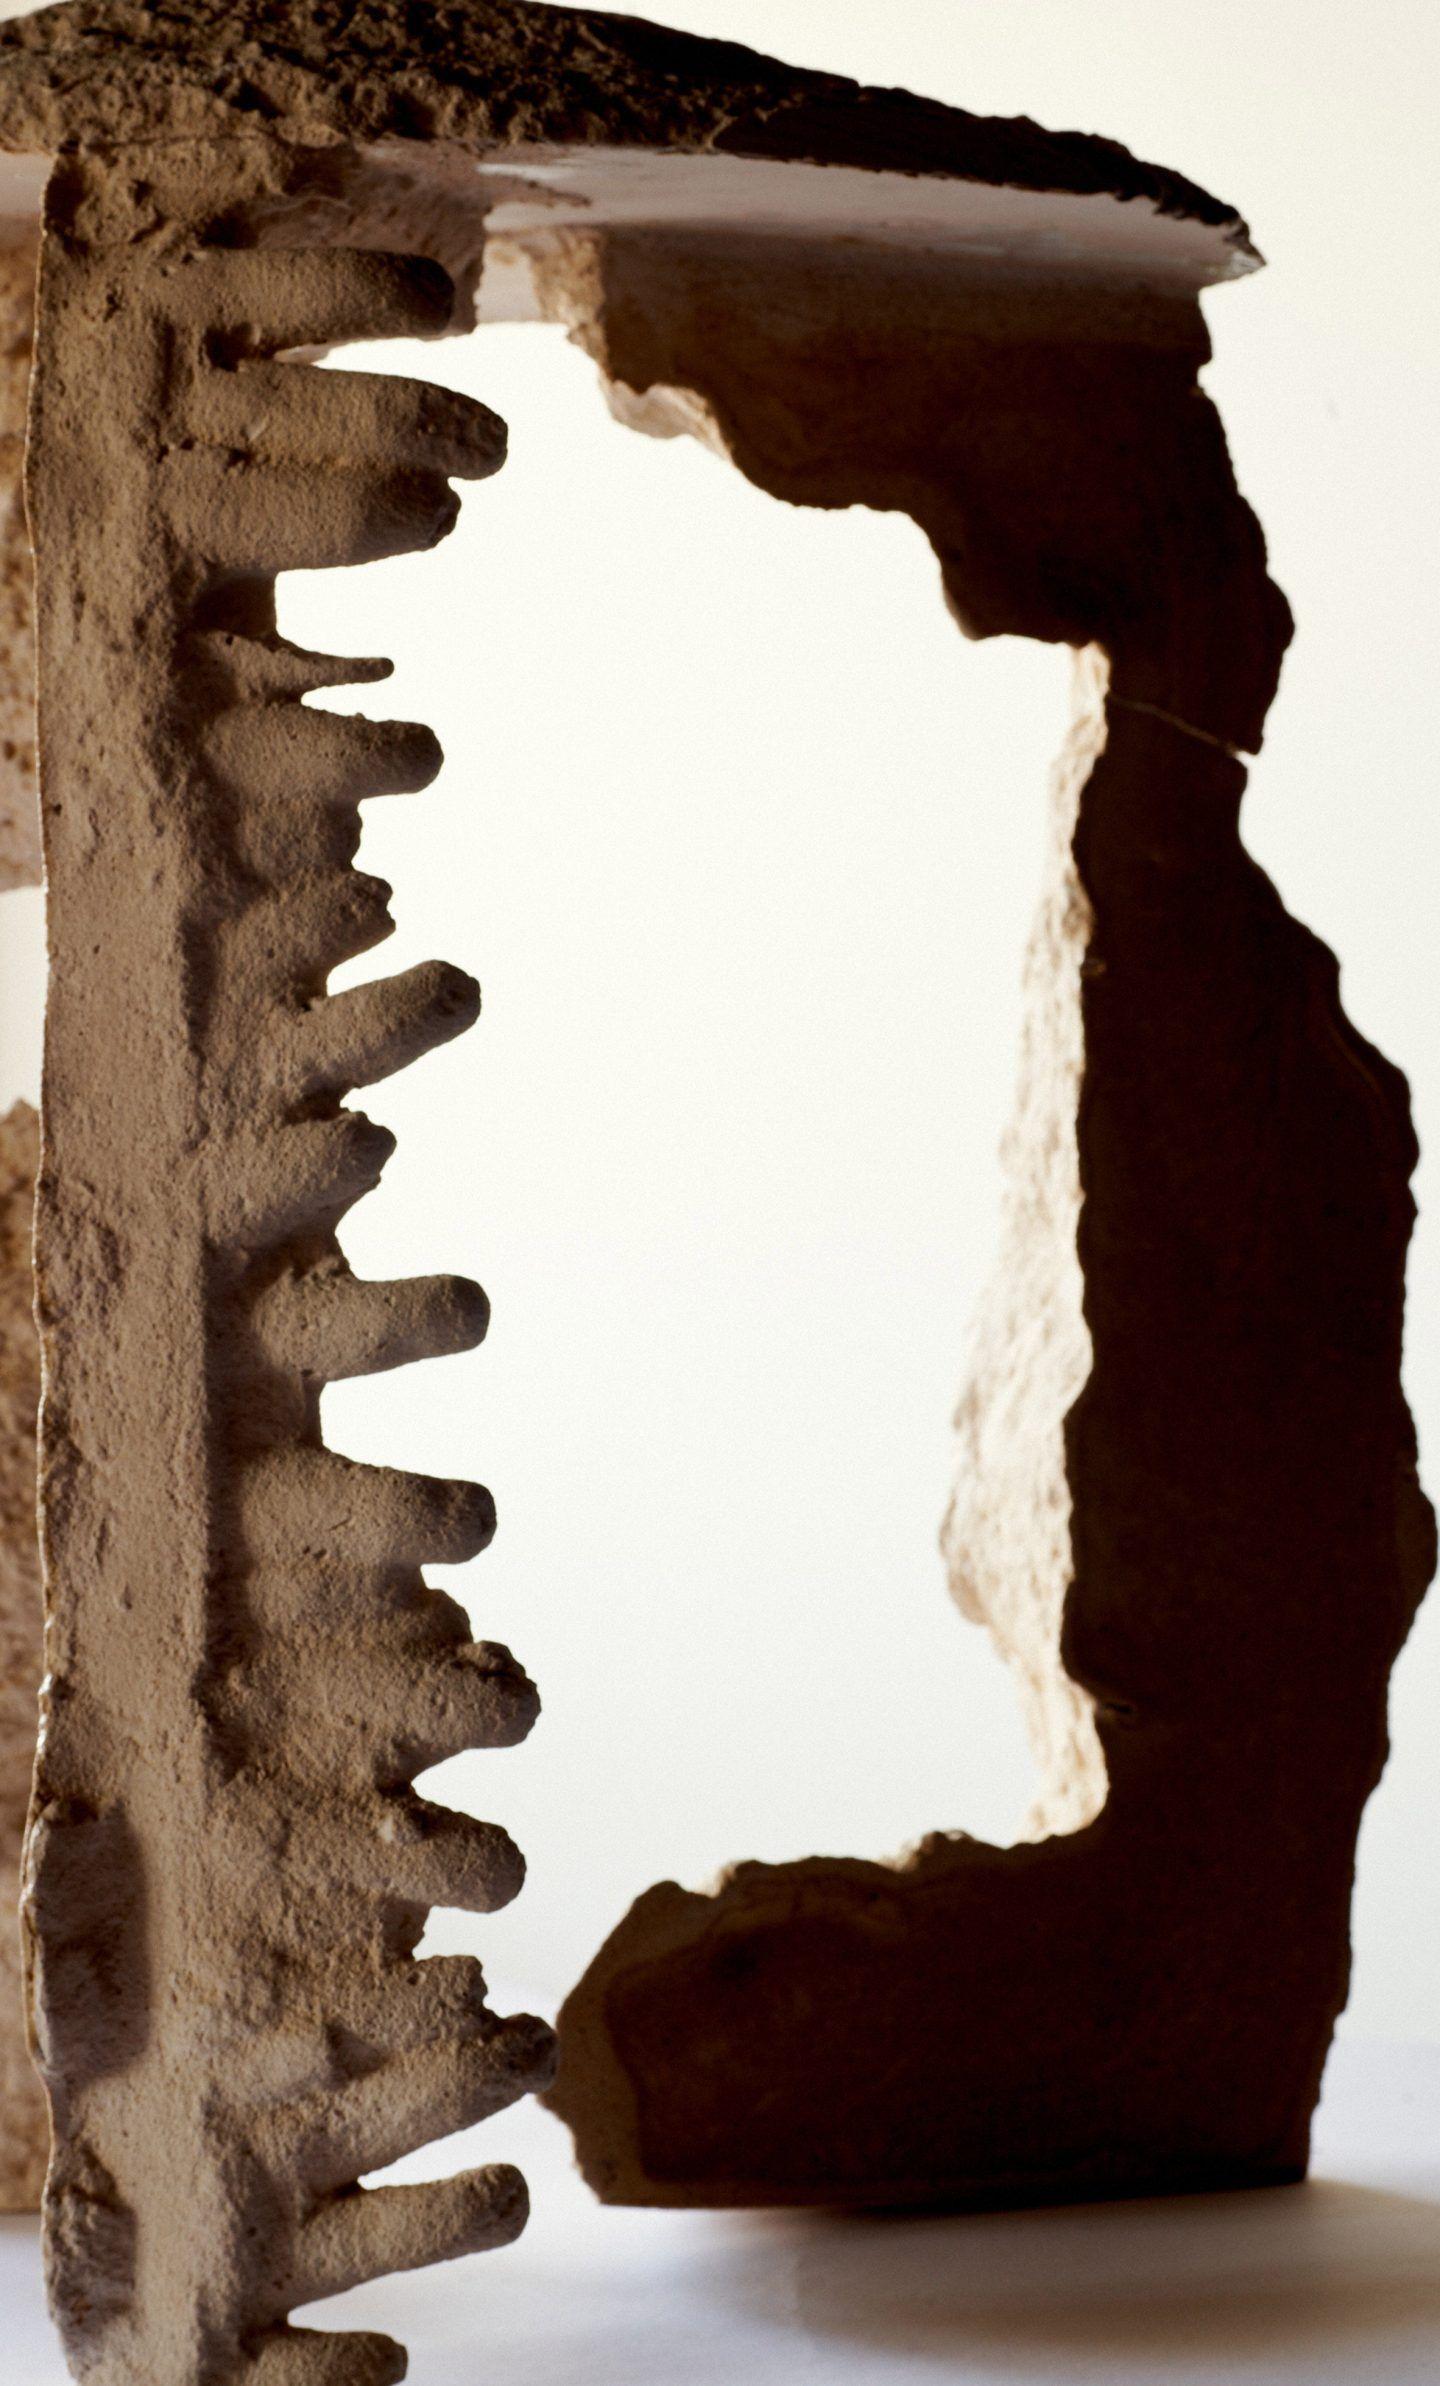 IGNANT-Design-Kajsa-Melchior-Fictive-Erosion-02